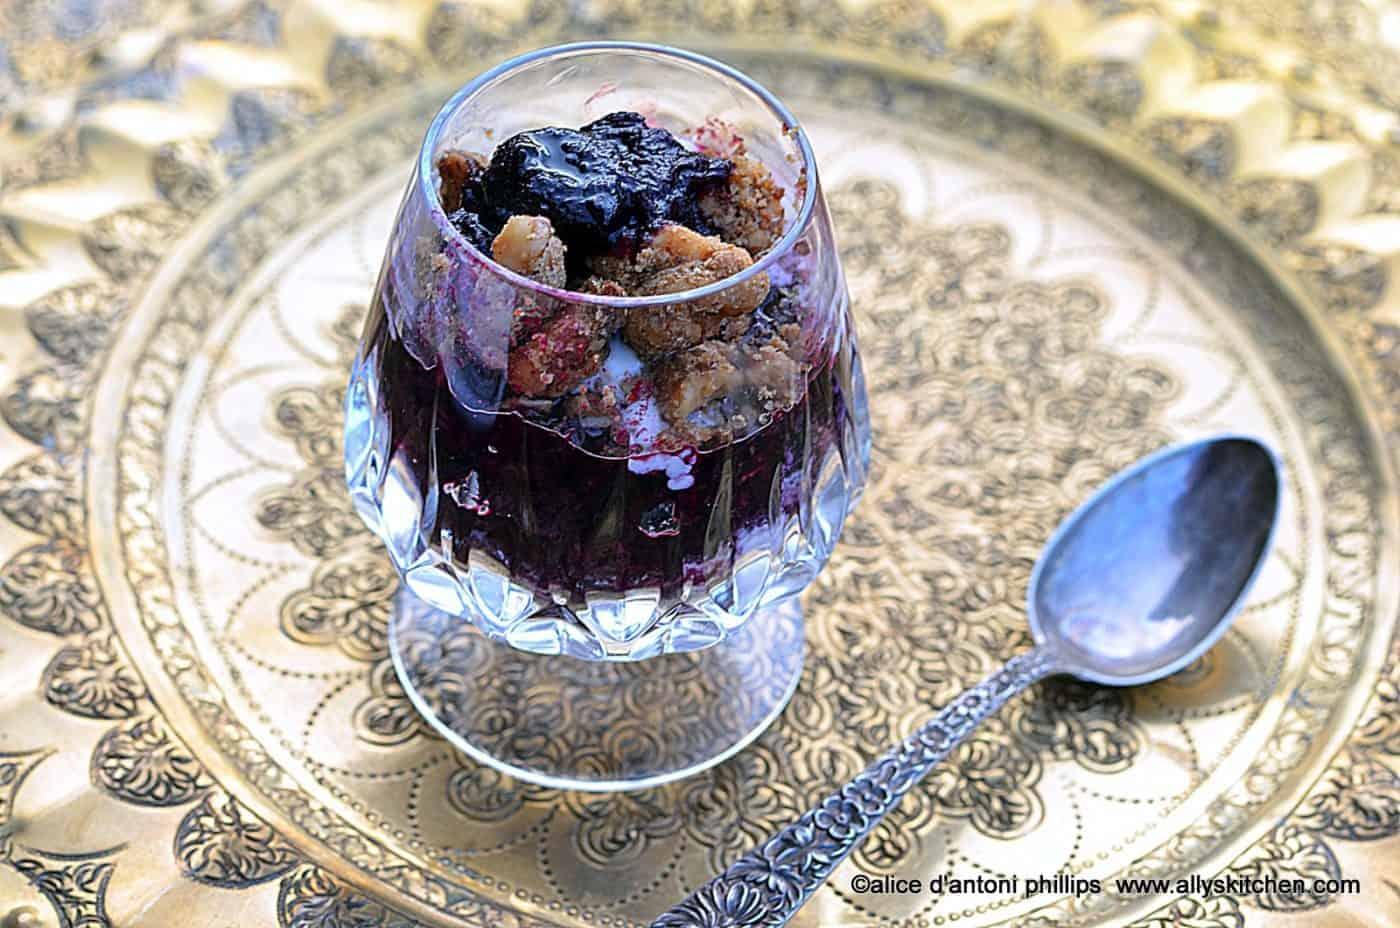 Blueberry Rhubarb Crumbles